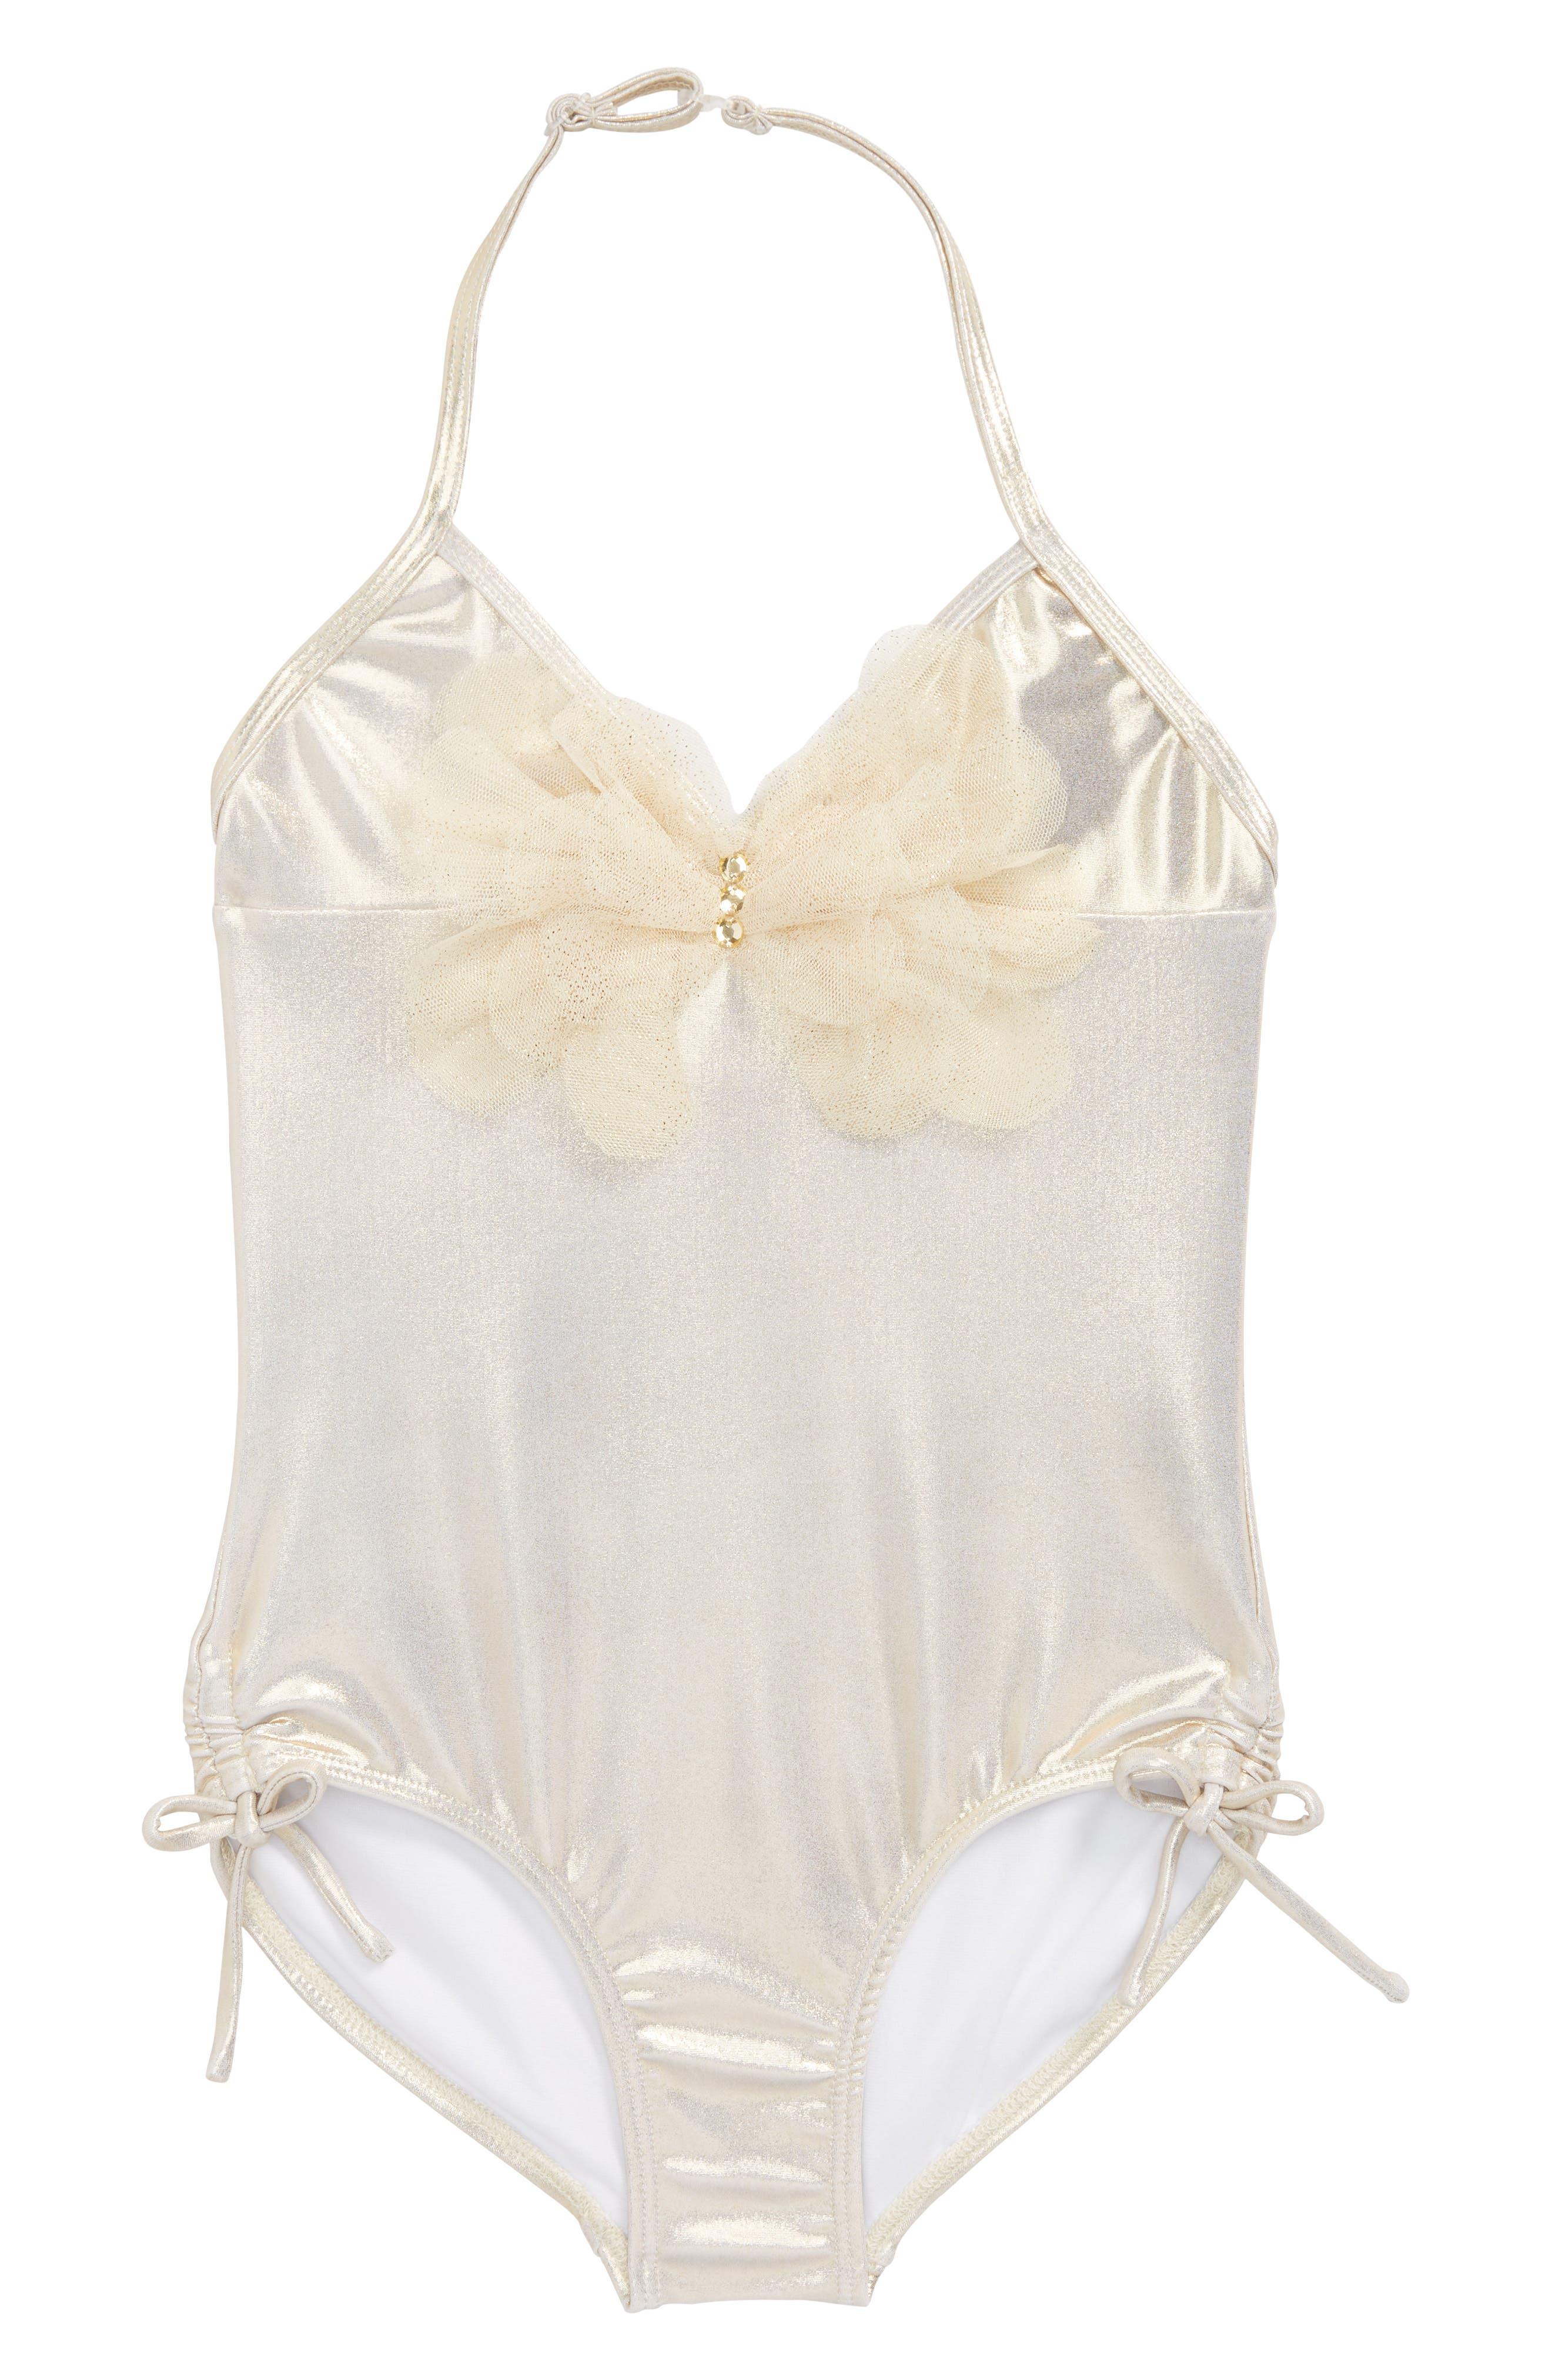 KATE MACK One-Piece Halter Swimsuit, Main, color, 710